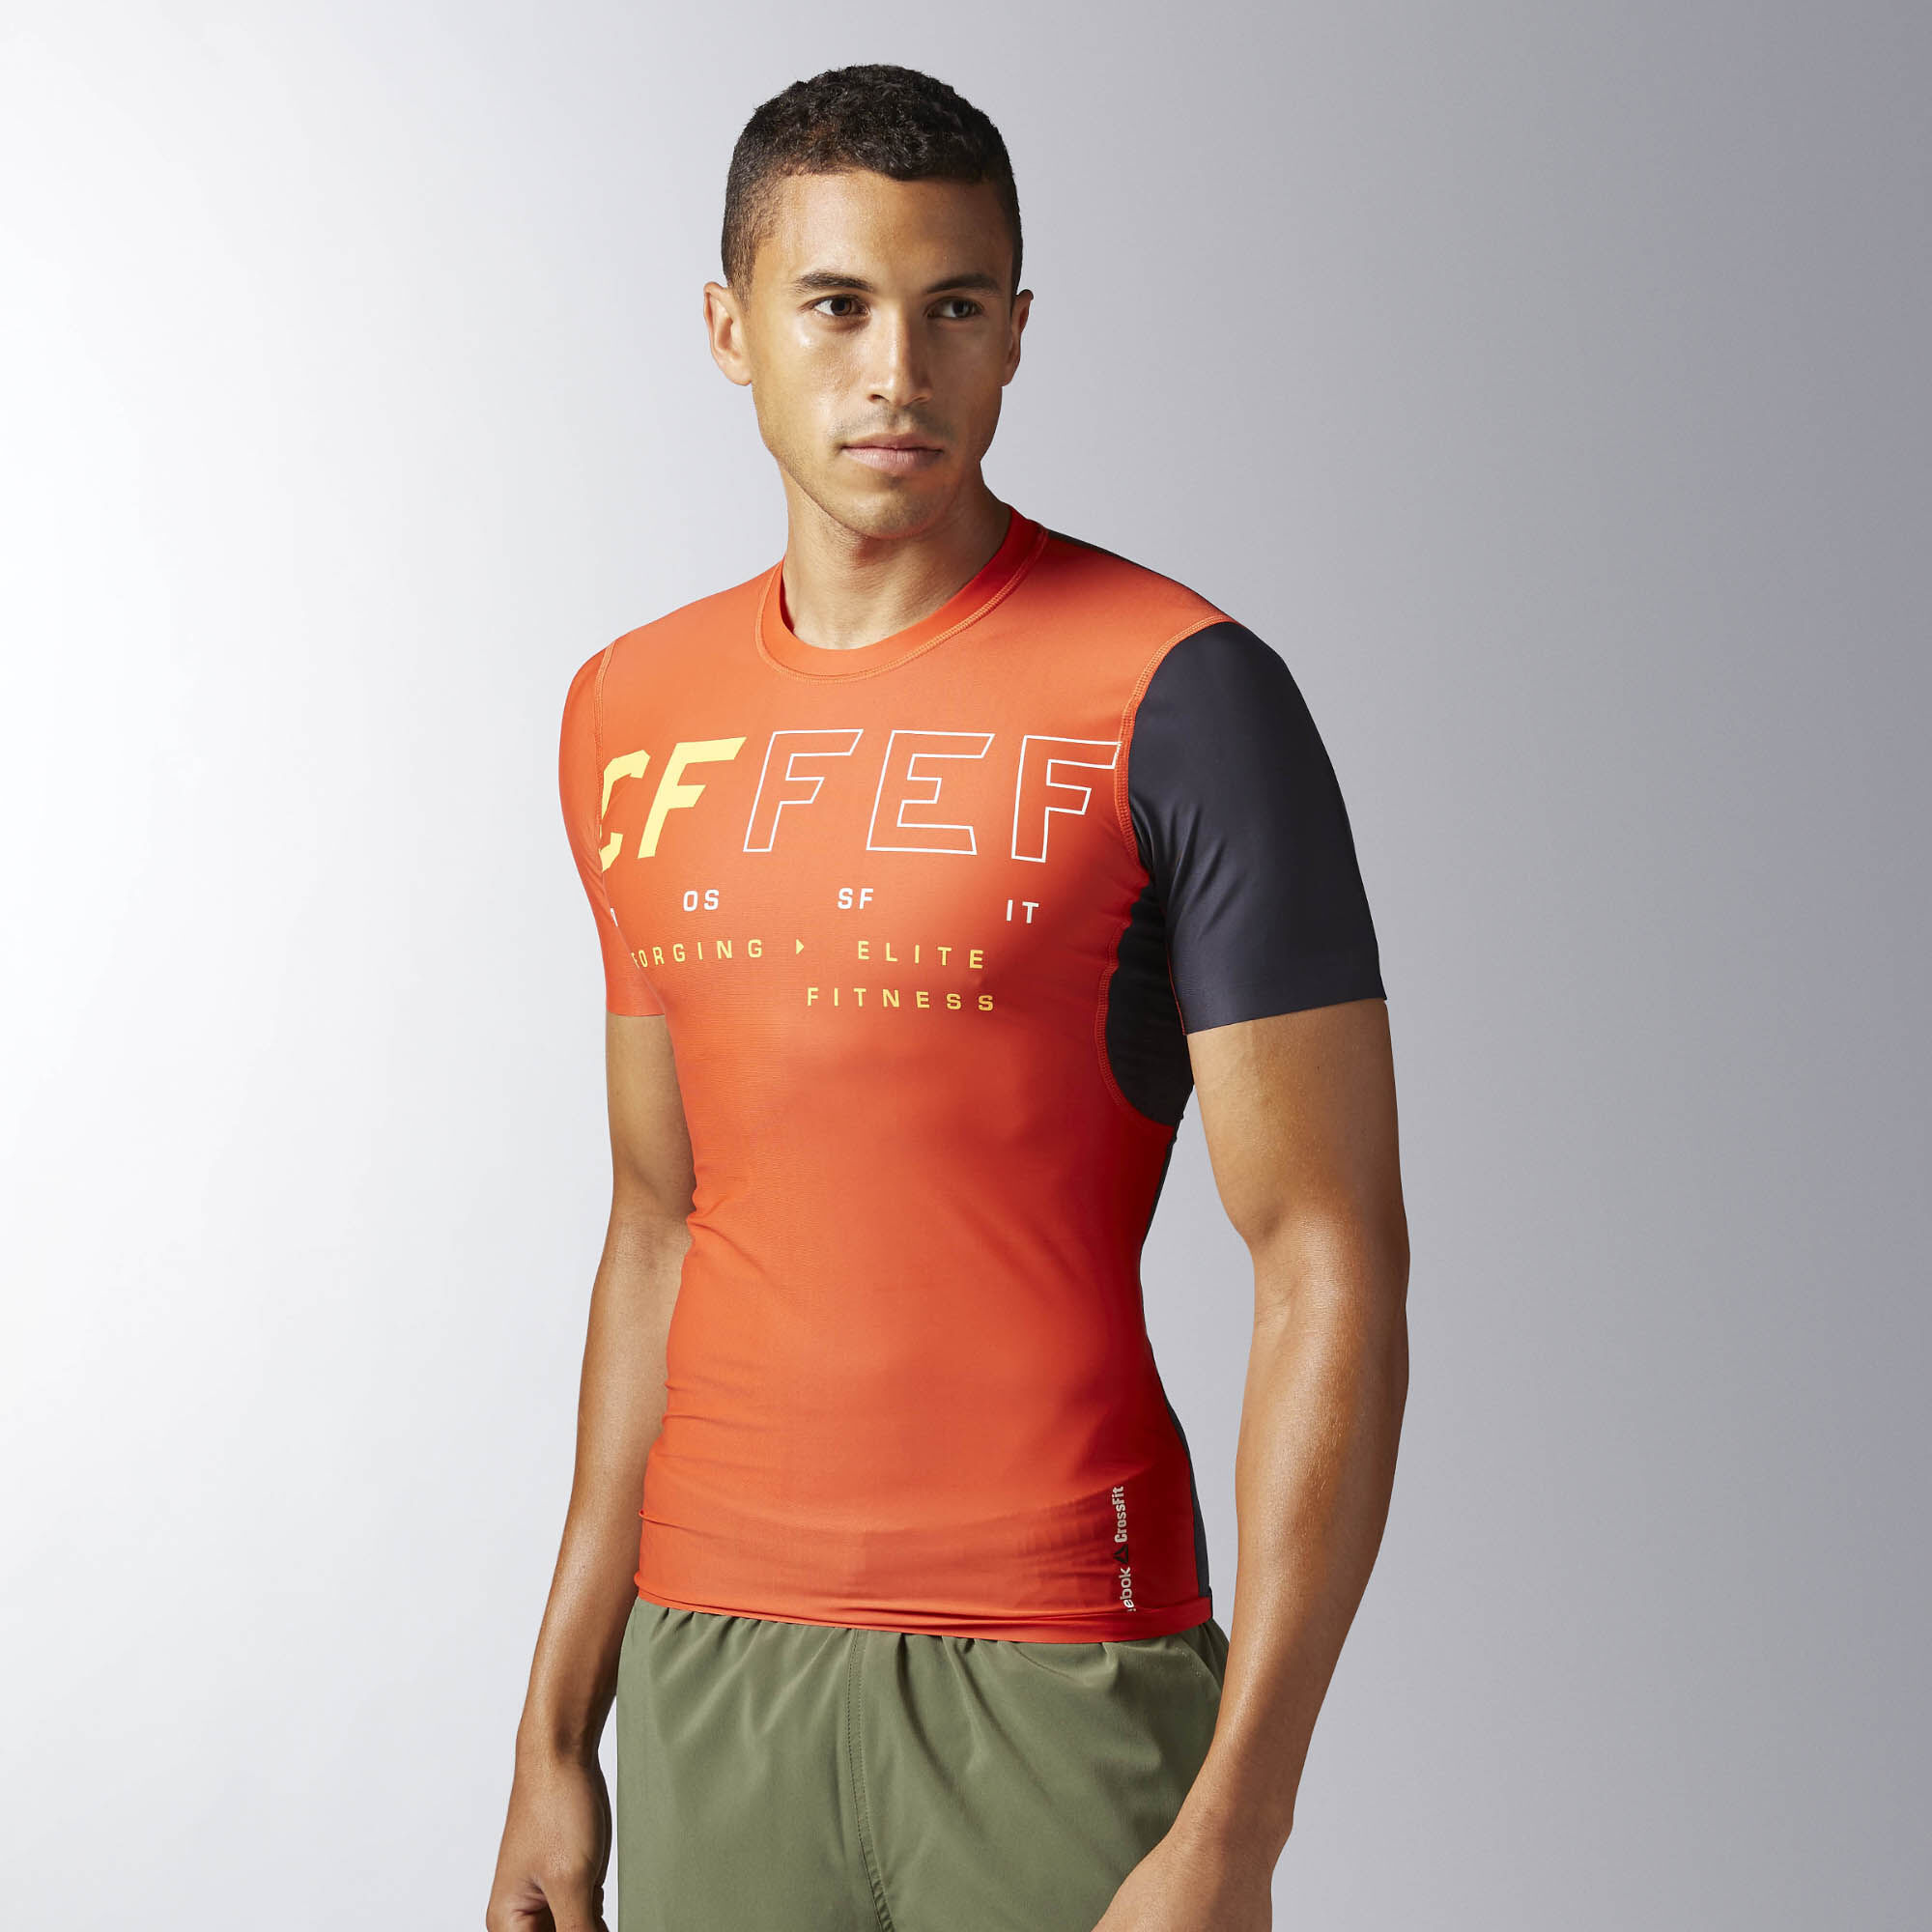 Reebok crossfit compression t shirt for Reebok crossfit t shirts